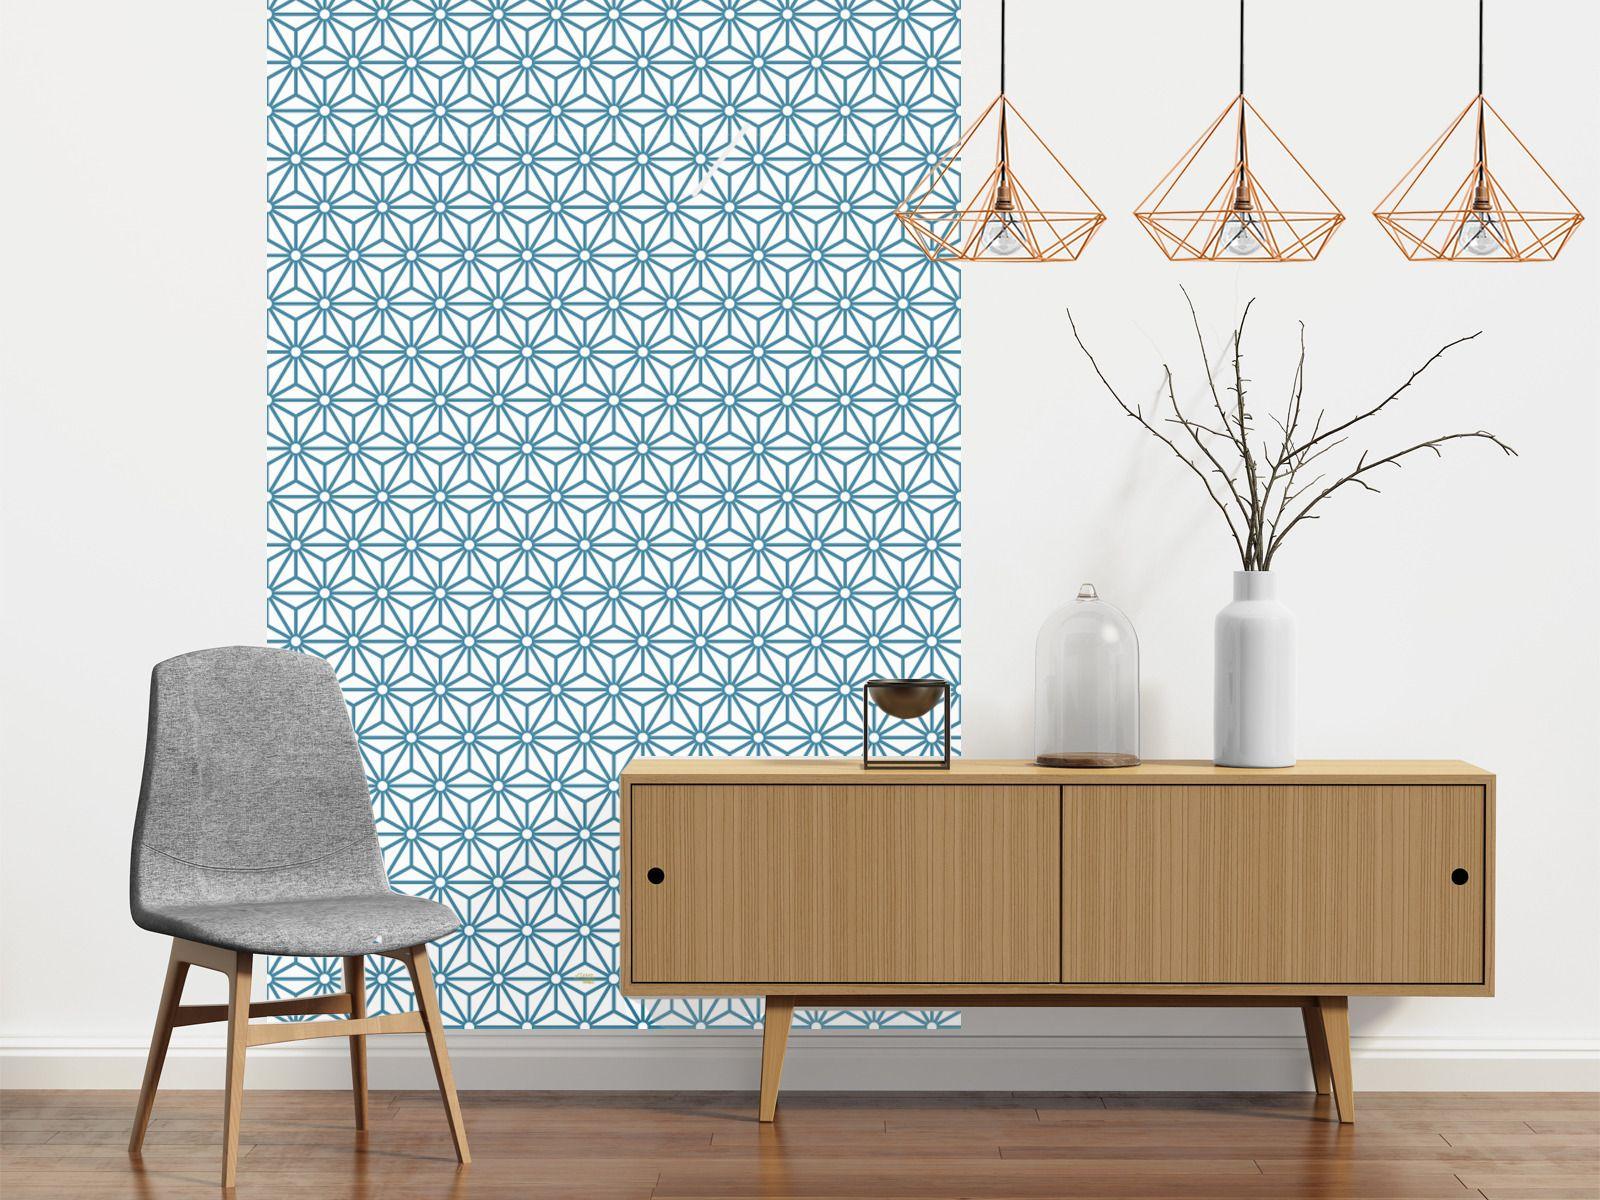 sterling bleu papier peint adh sif repositionnable papier peint adh sif papier peint et. Black Bedroom Furniture Sets. Home Design Ideas